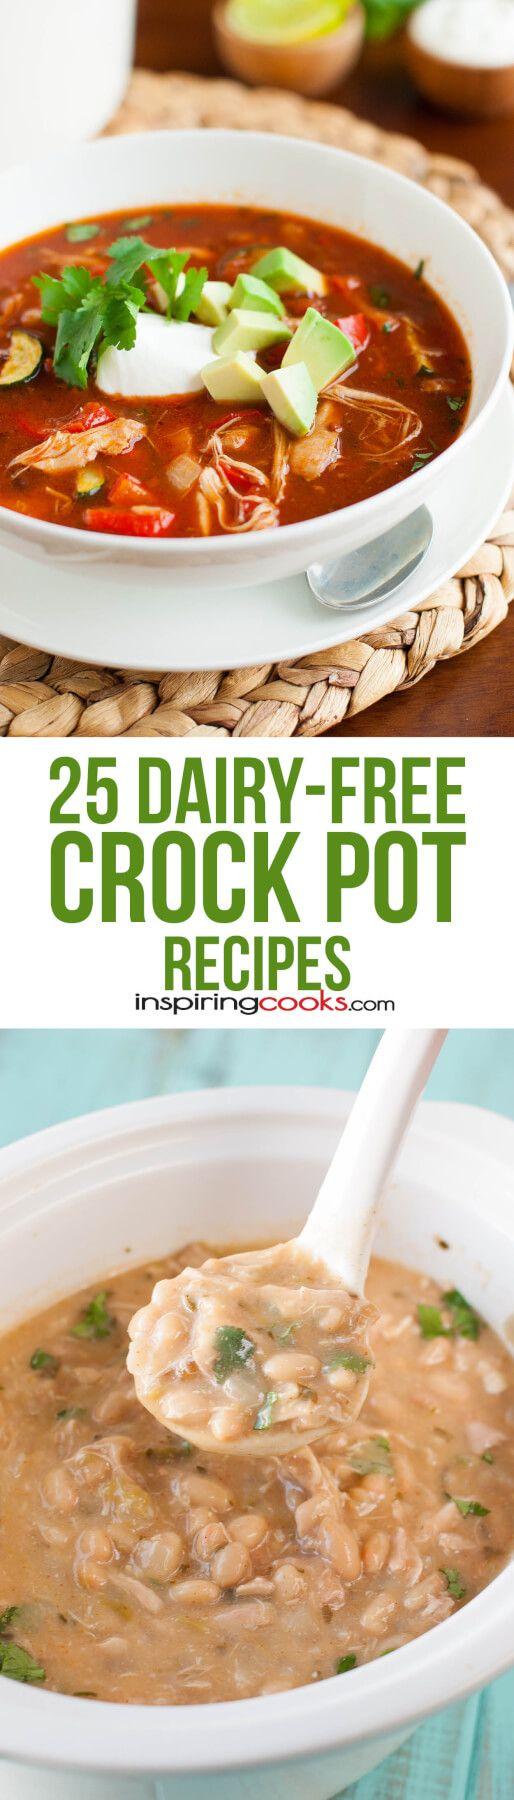 9 Dairy Free Crock Pot Recipes No Milk Or Cream Here